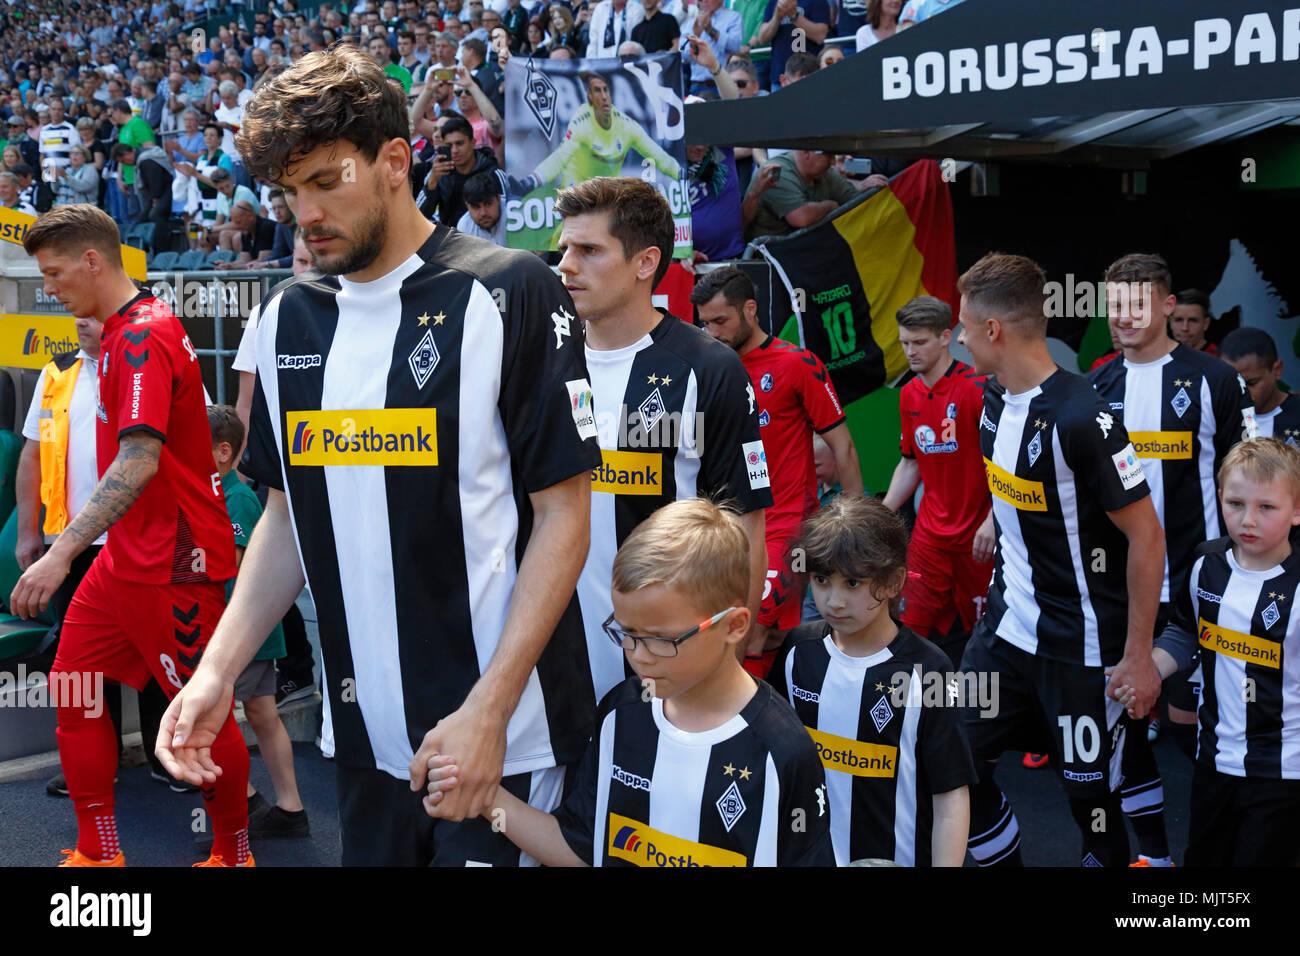 sports,football,Bundesliga,2017/2018,Borussia Moenchengladbach vs SC Freiburg 3:1,Stadium Borussia Park,teams and the running-in kids come in,ahead f.l.t.r. Mike Frantz (Freiburg),Tobias Strobl (MG),Jonas Hofmann (MG),Thorgan Hazard (MG),Michael Cuisance (MG) - Stock Image